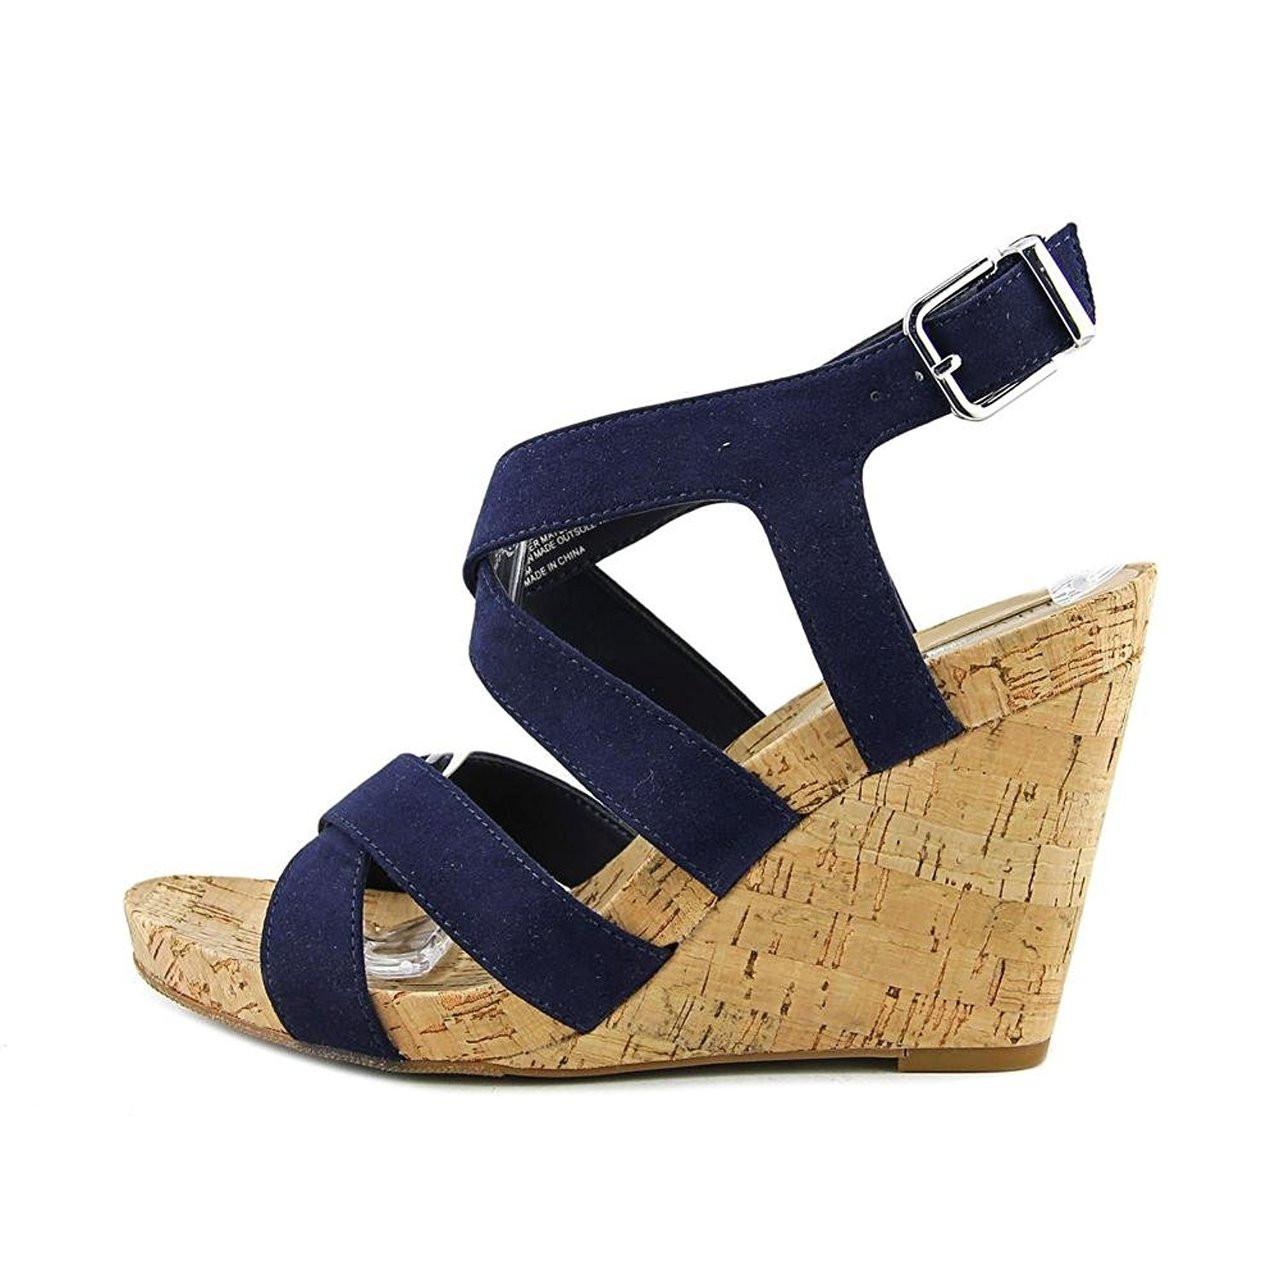 097e0251c33e ... INC International Concepts Womens Landor Fabric Open Toe Casual  Platform Sandals~pp-104def98